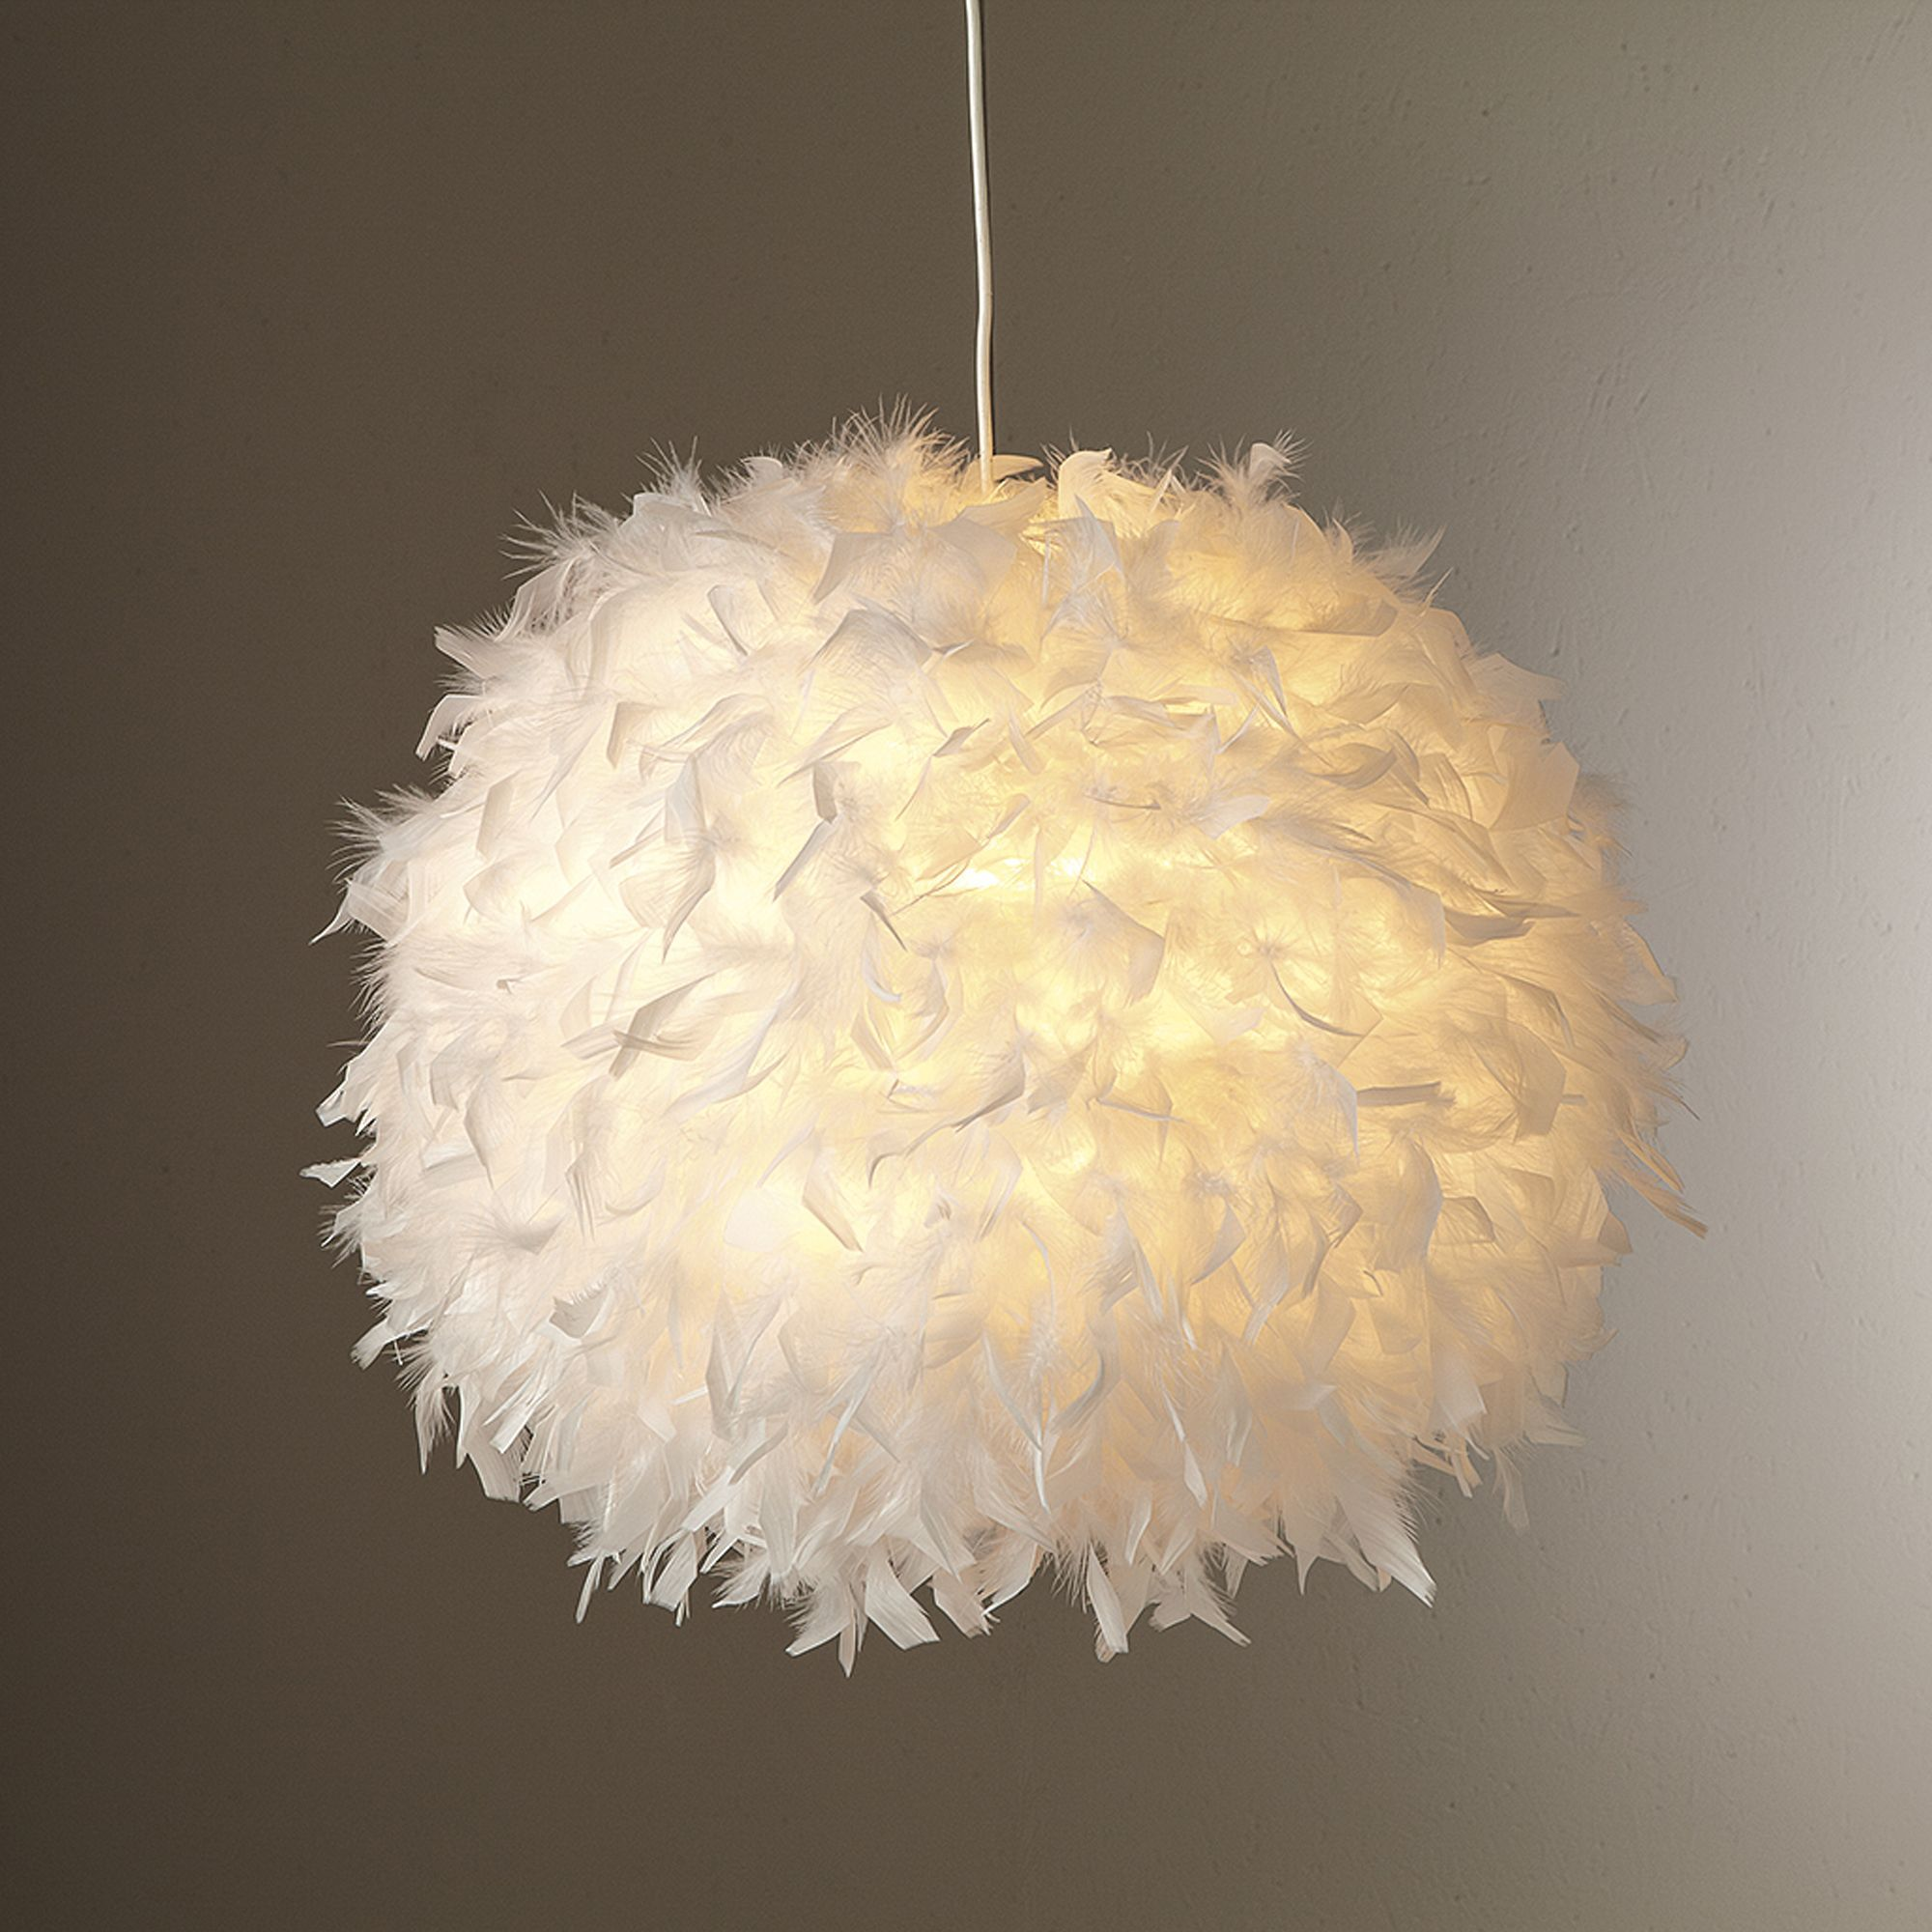 Suspension boule en plumes non lectrifi blanc kokot - Lustre boule ikea ...